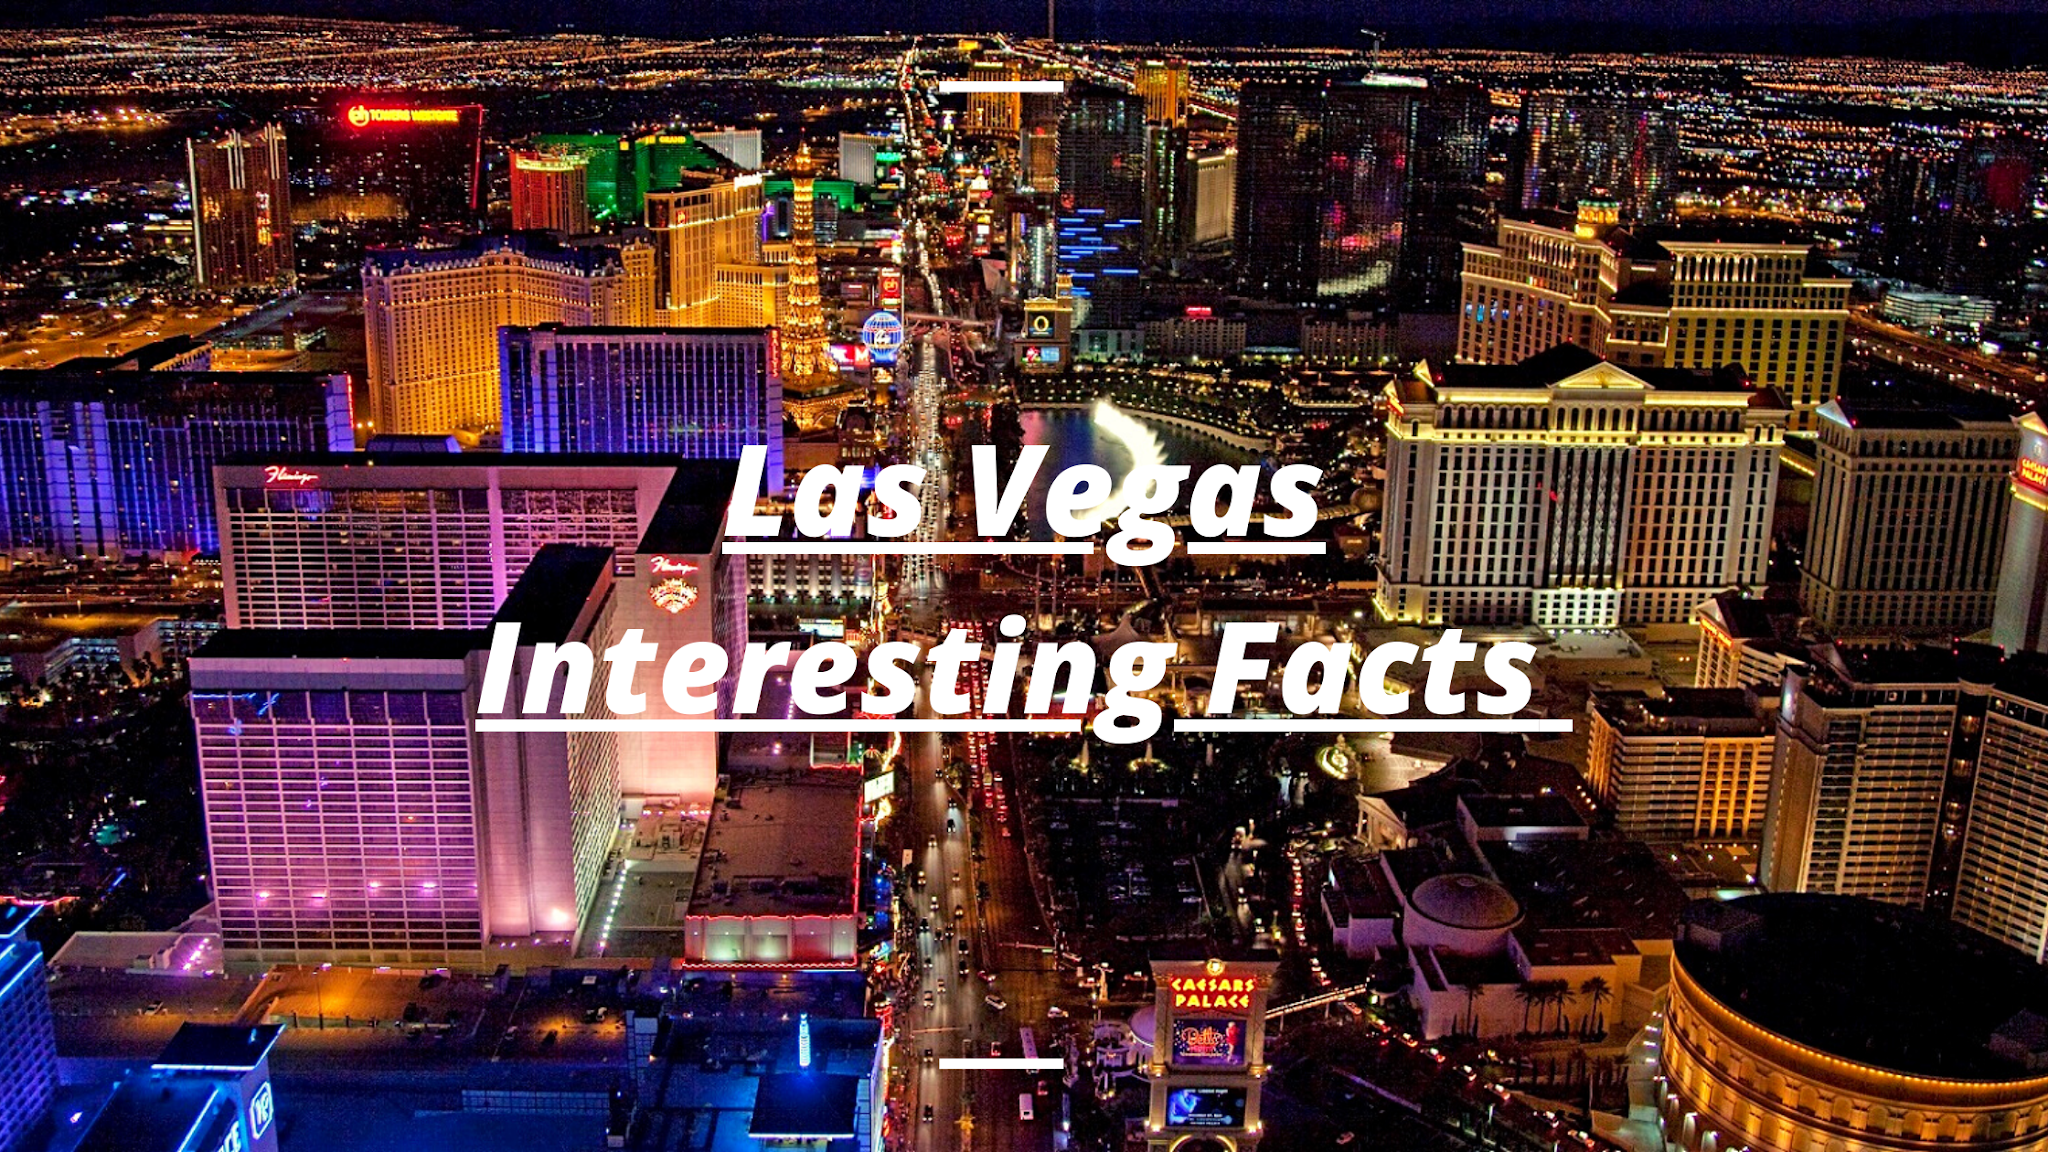 Las Vegas Interesting Facts